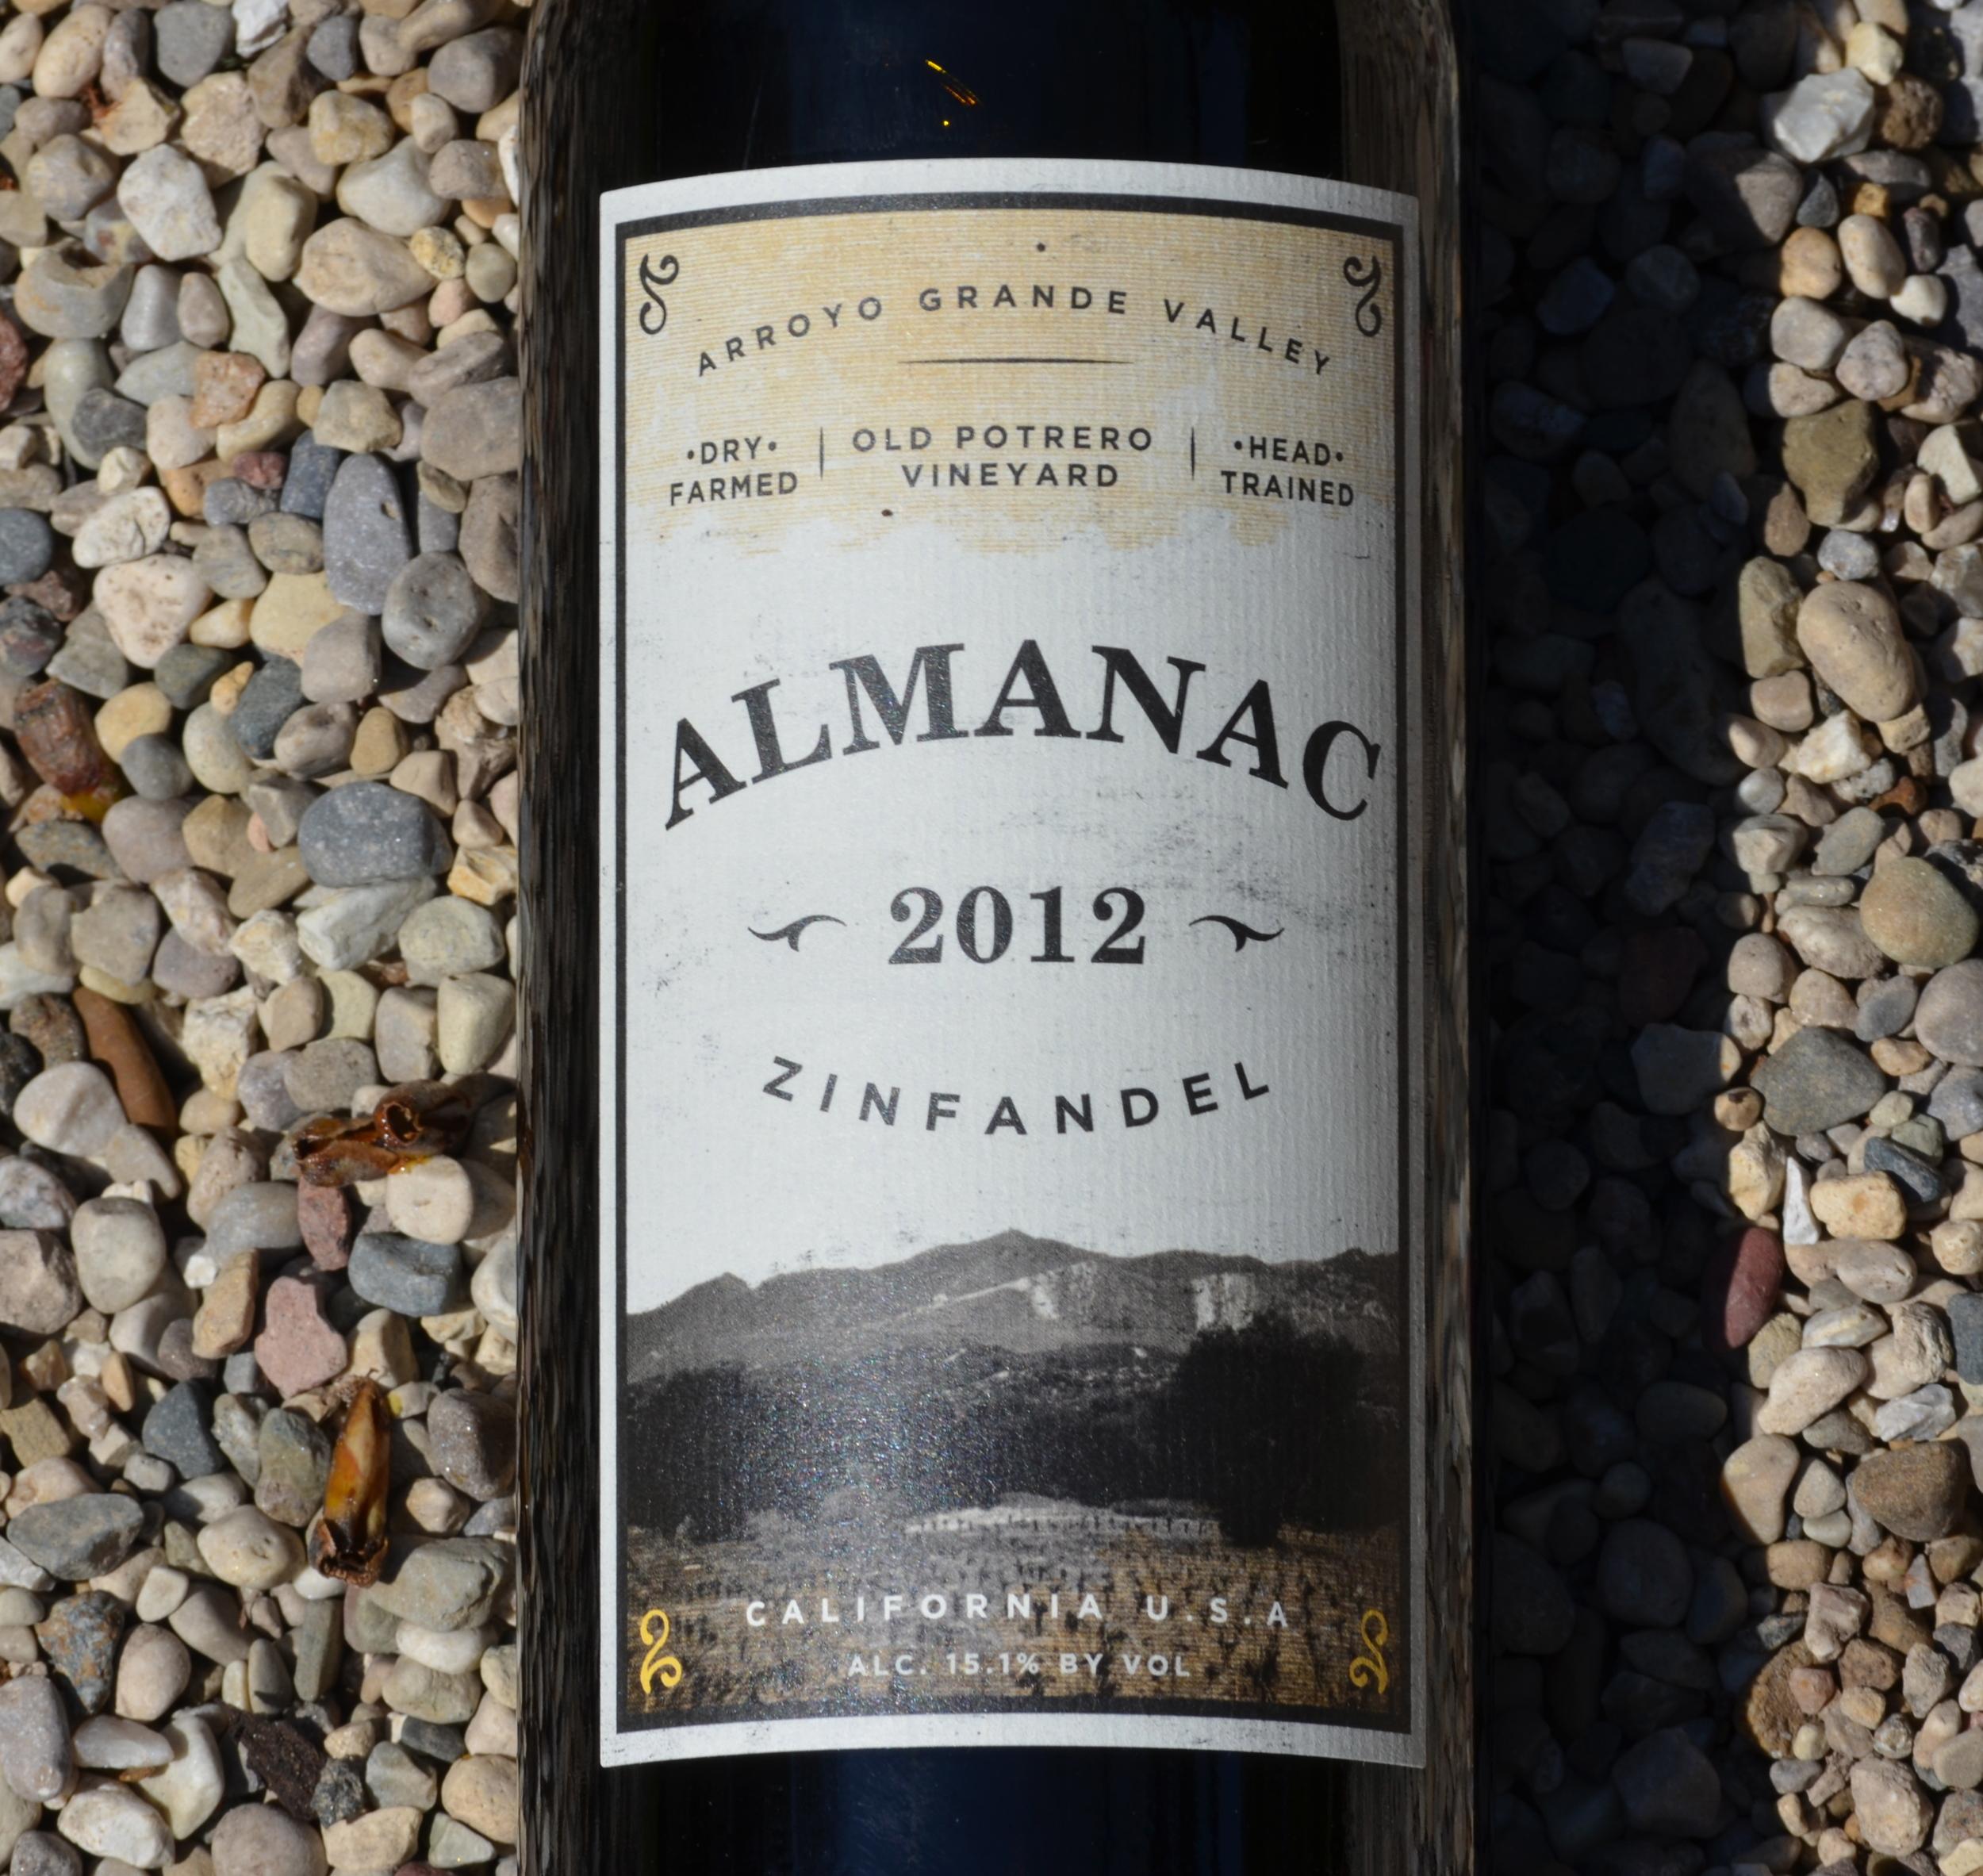 Alamanac